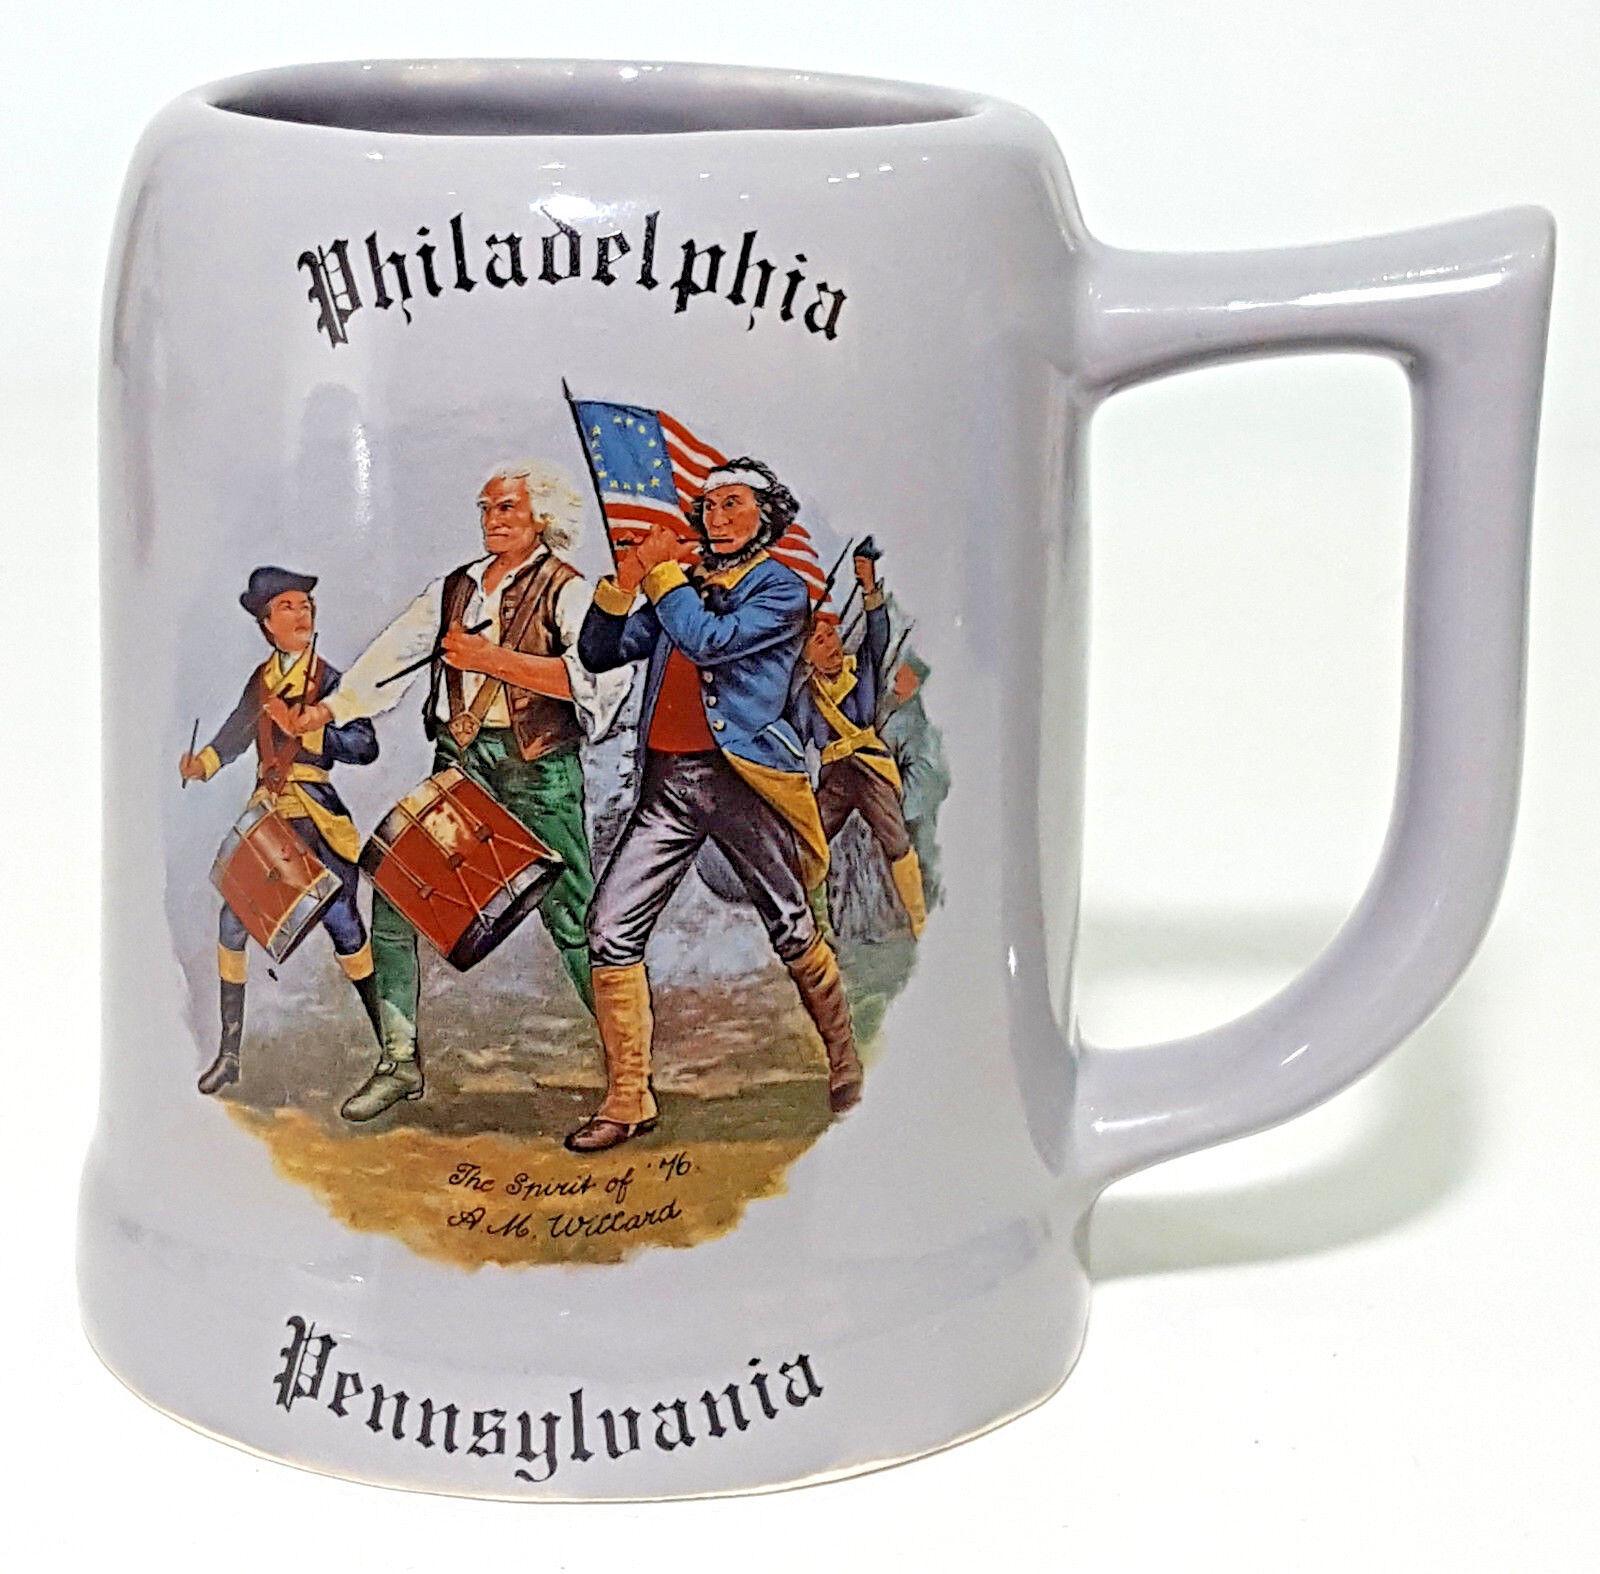 Philadelphia Mug The Spirit Of '76 Created By Walter J Seibold Salice Boschetto